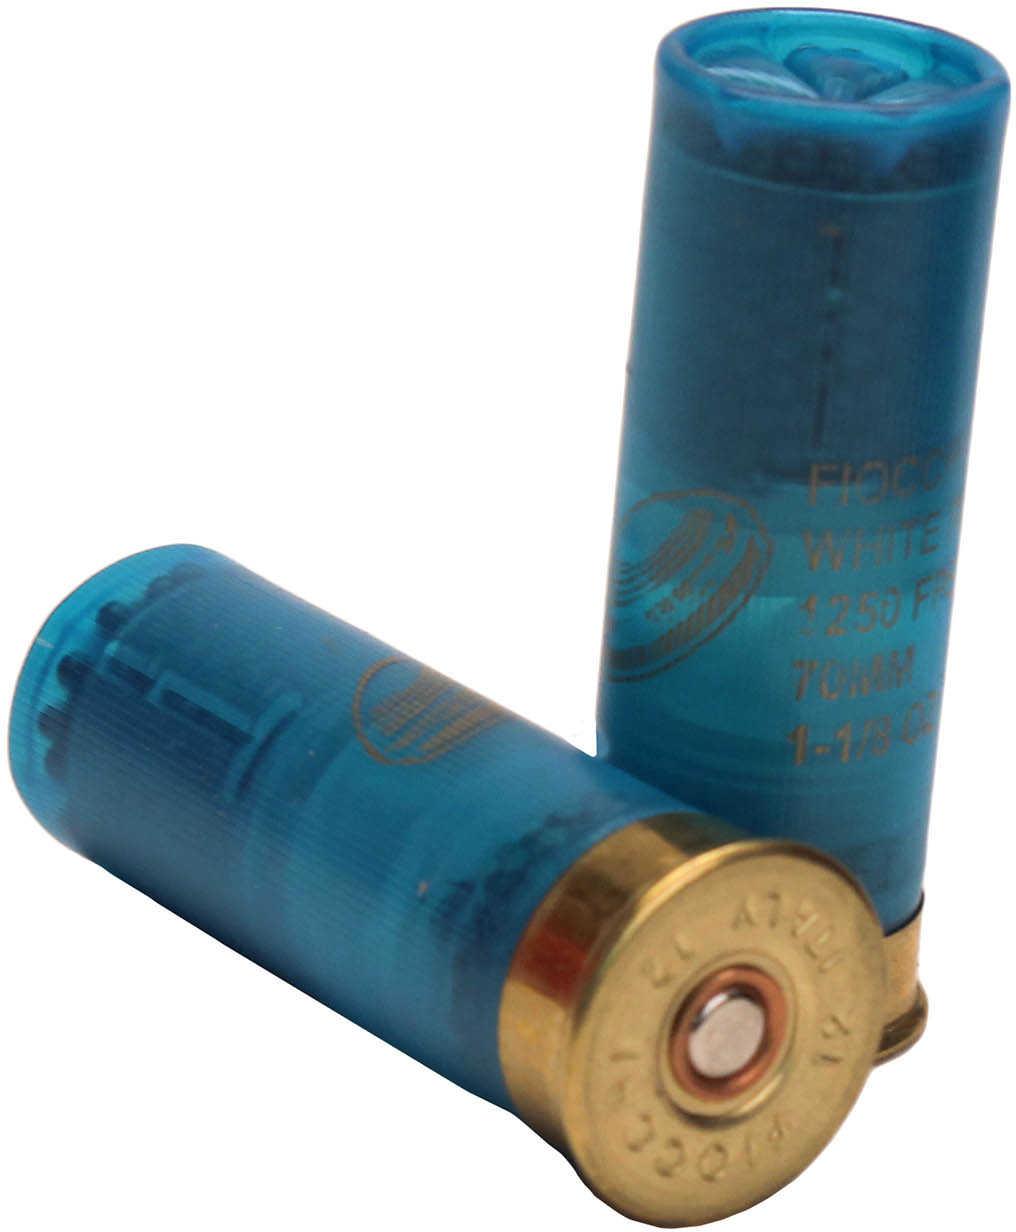 "Fiocchi Ammo White Rino Target 12 Gauge 2 3/4"" 1 1/8Oz #8 25 Rounds Ammunition 12WRNO8"